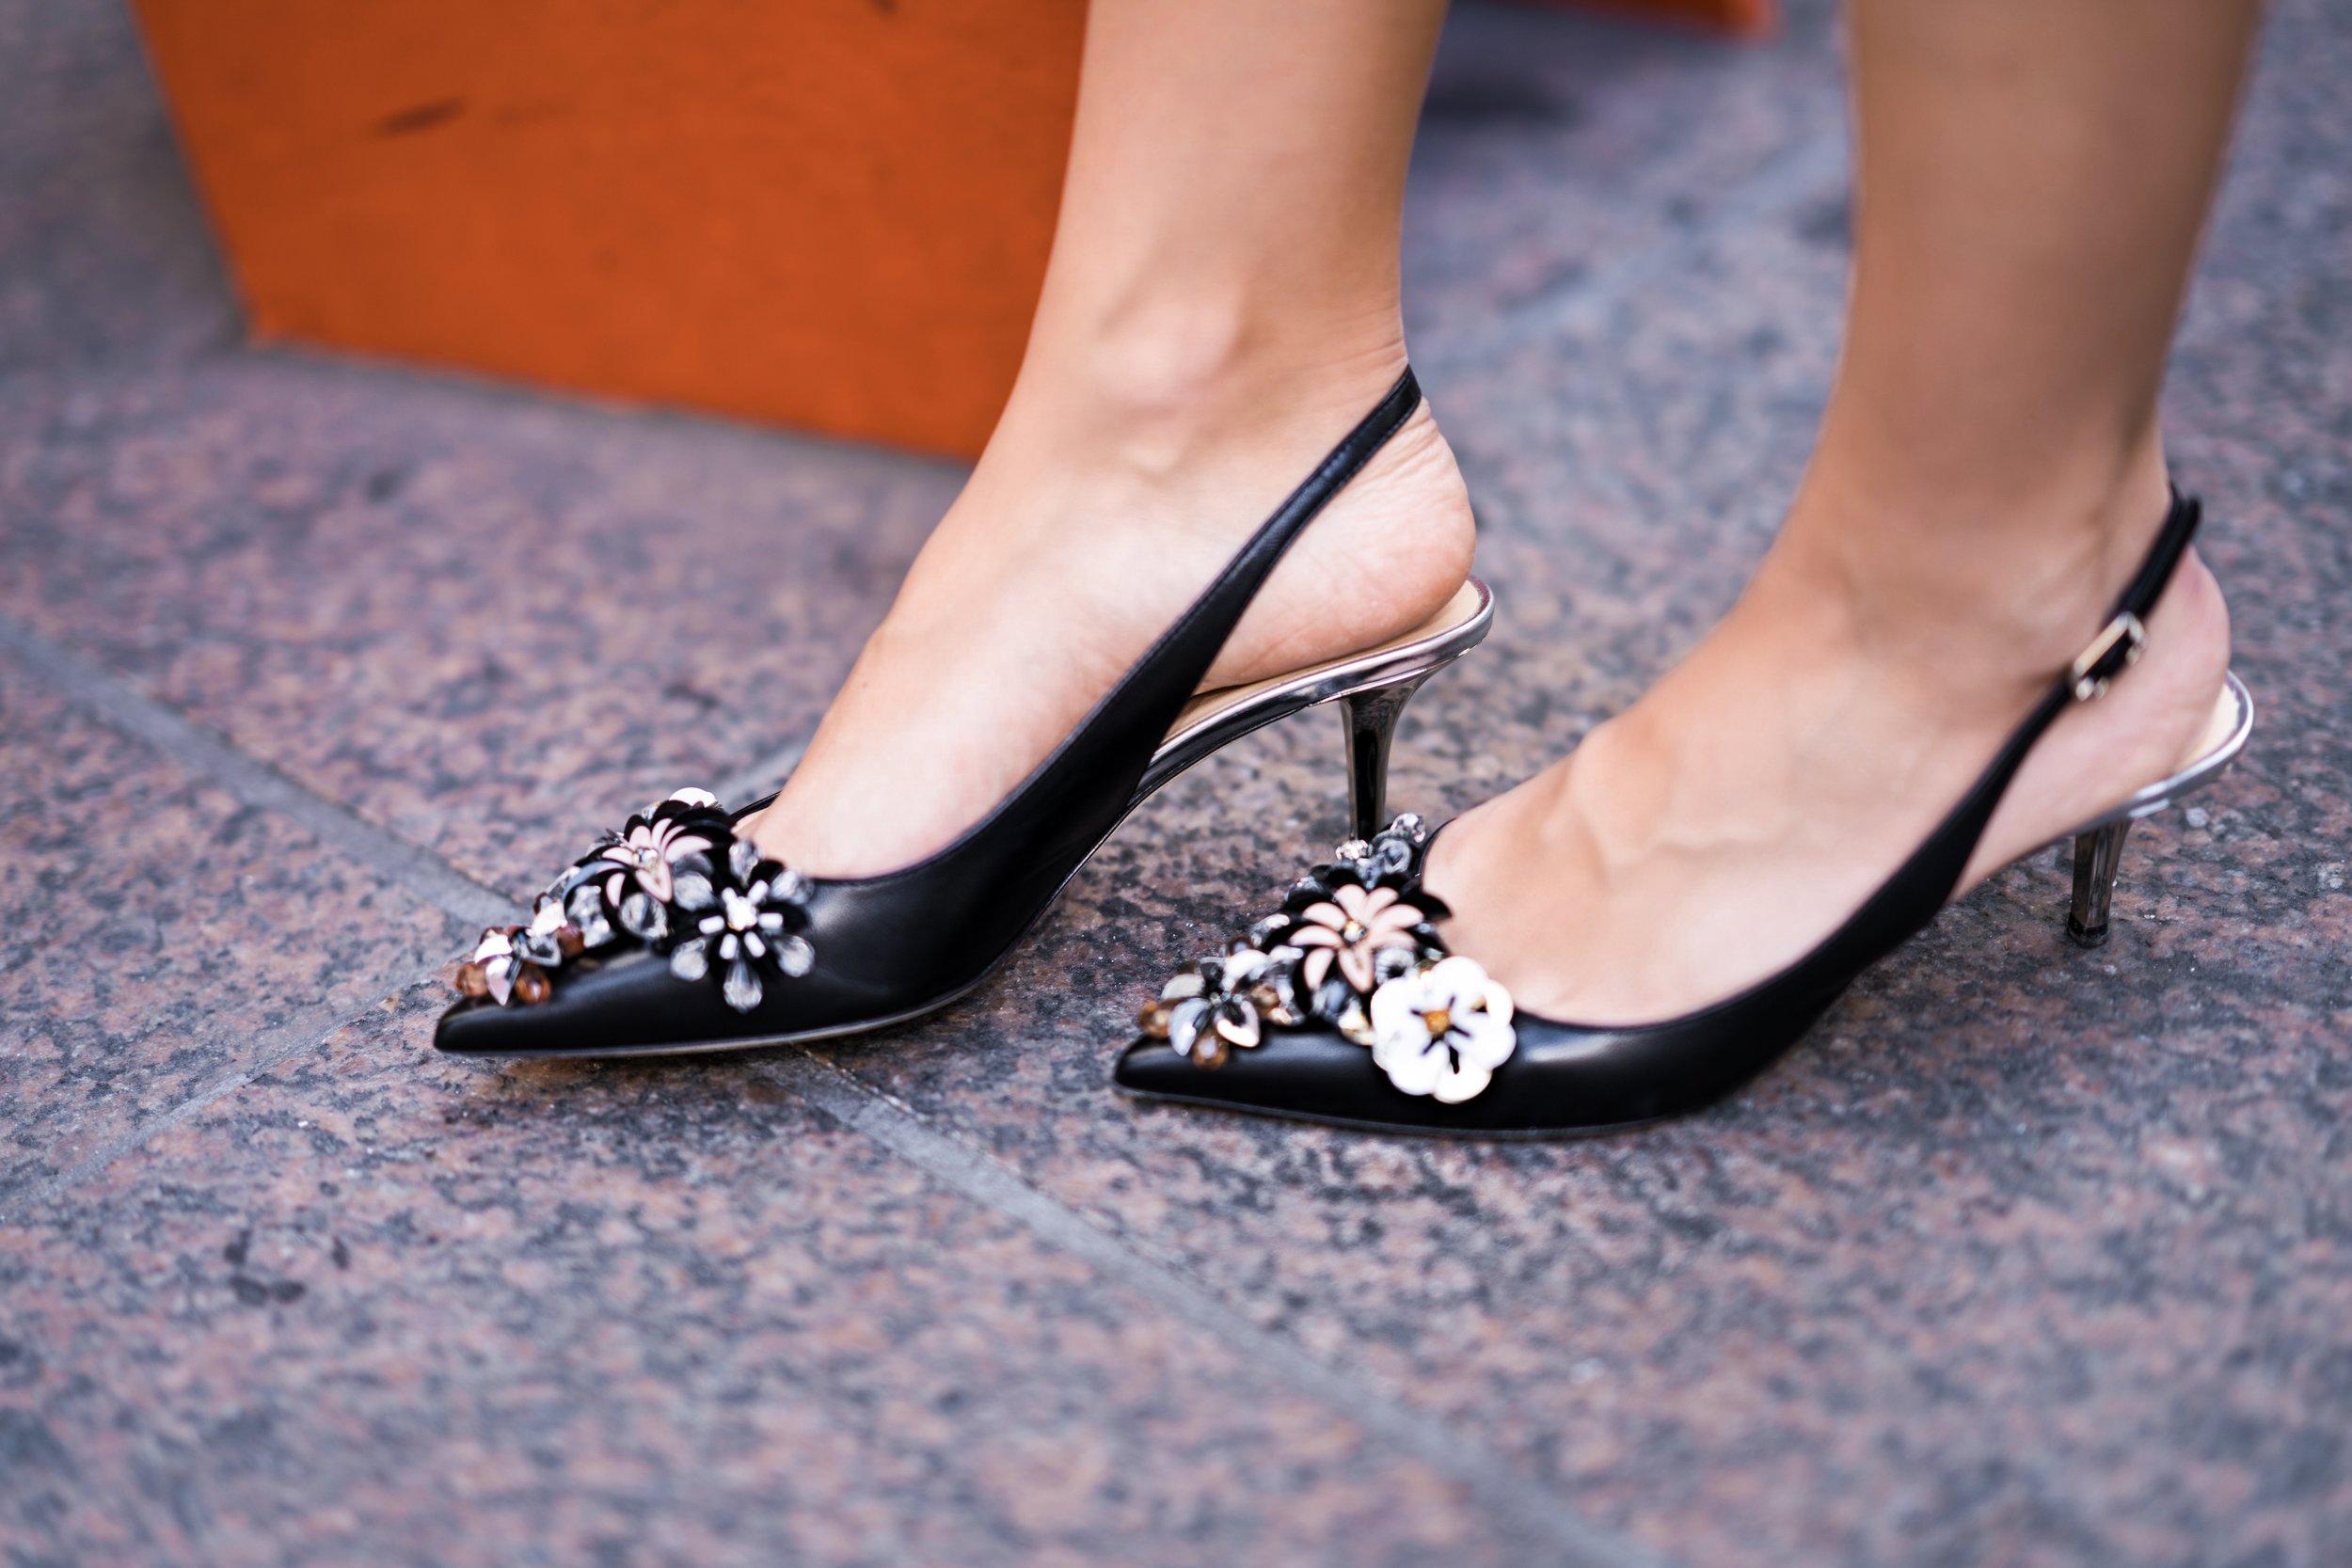 Floral kitten heels.